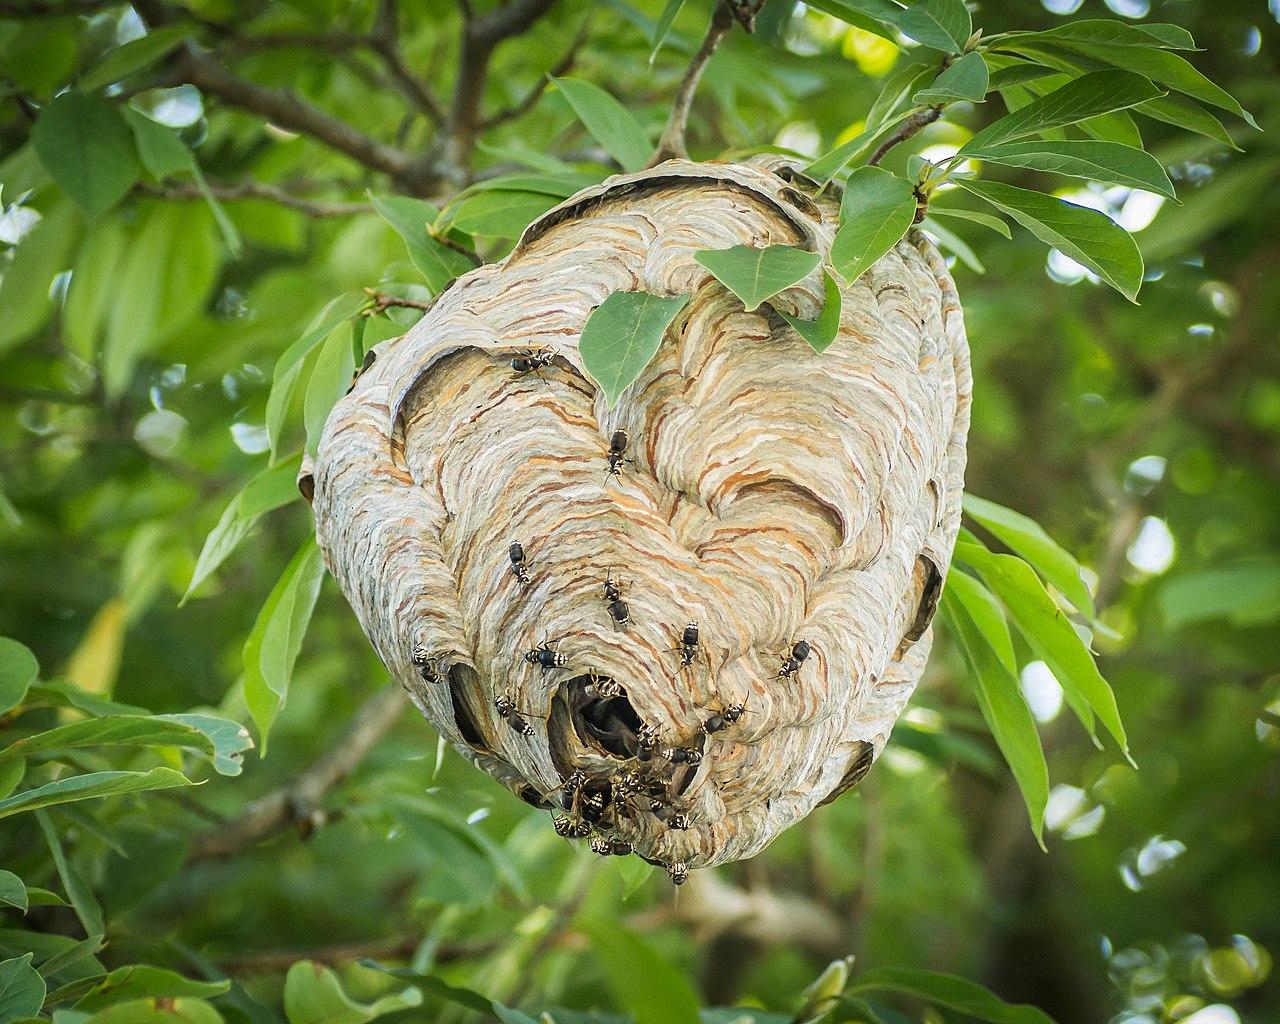 1280px-dolichovespula-maculata-bald-faced-hornet-nest.jpg